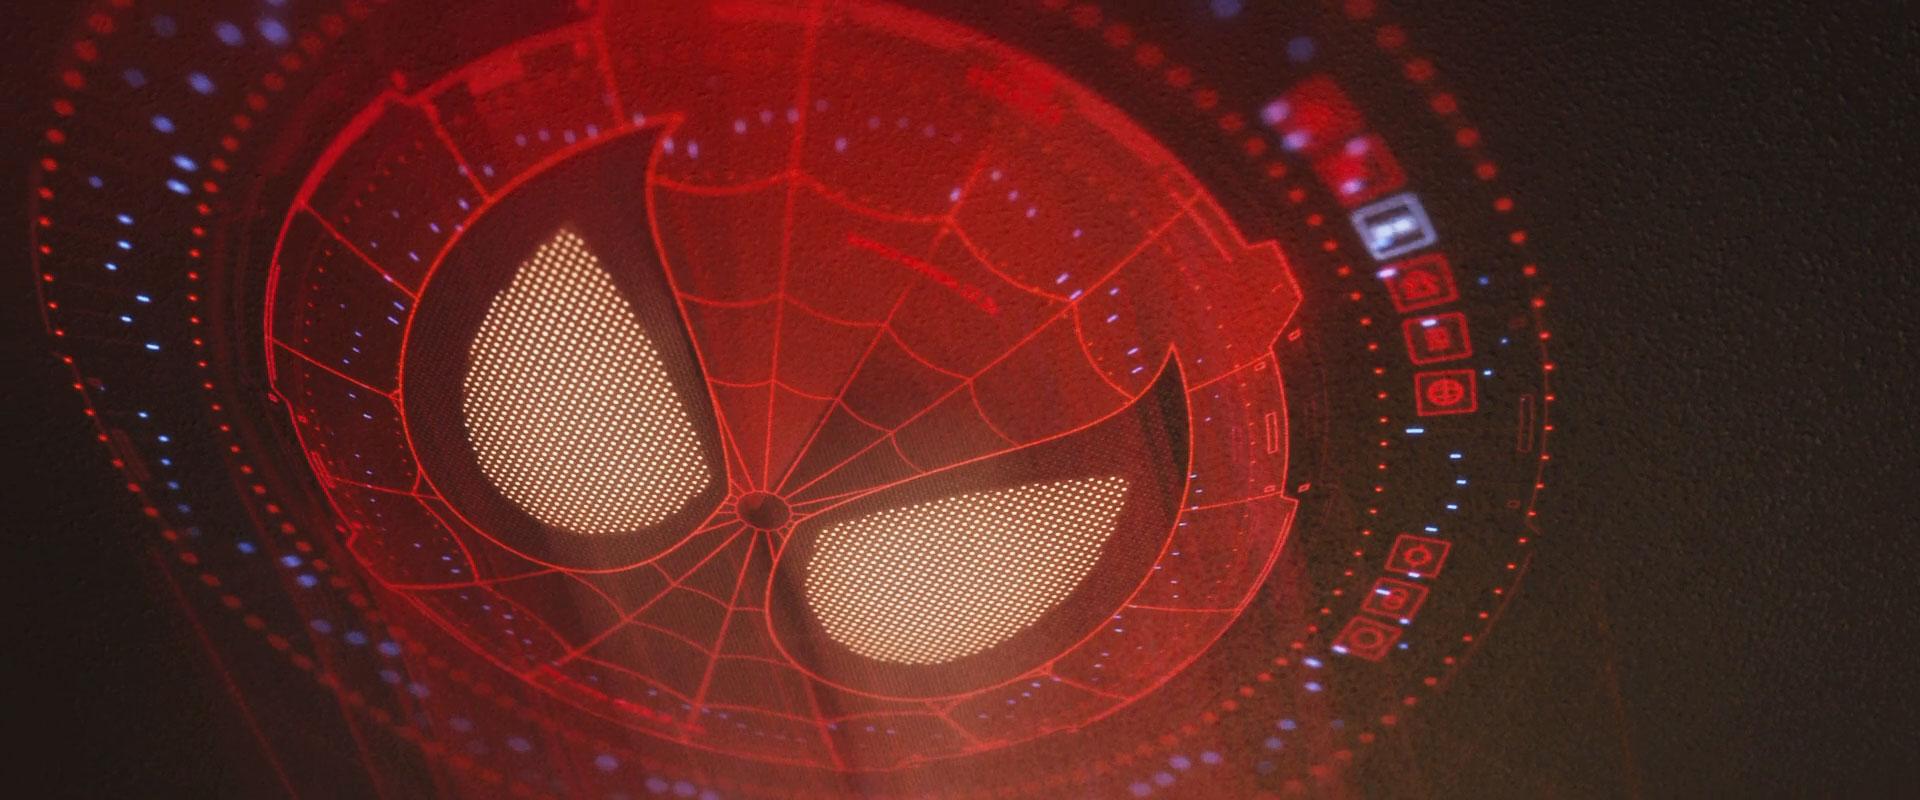 Civil_war_Spiderman_Signal_CapCIvilWar_Perception